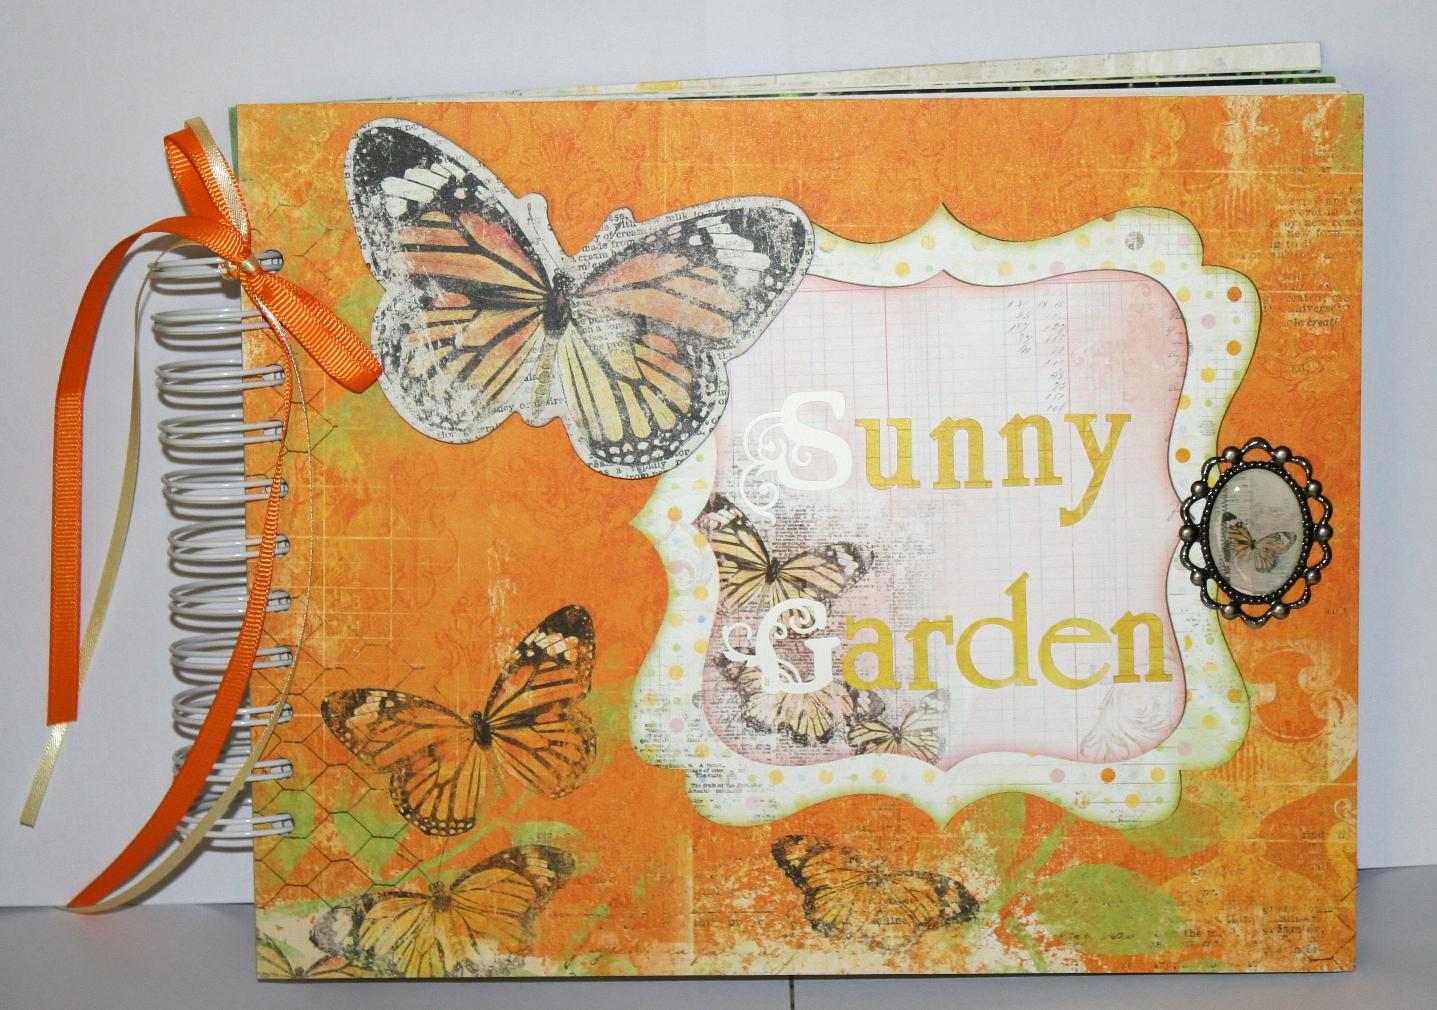 Альбом - Sunny Garden